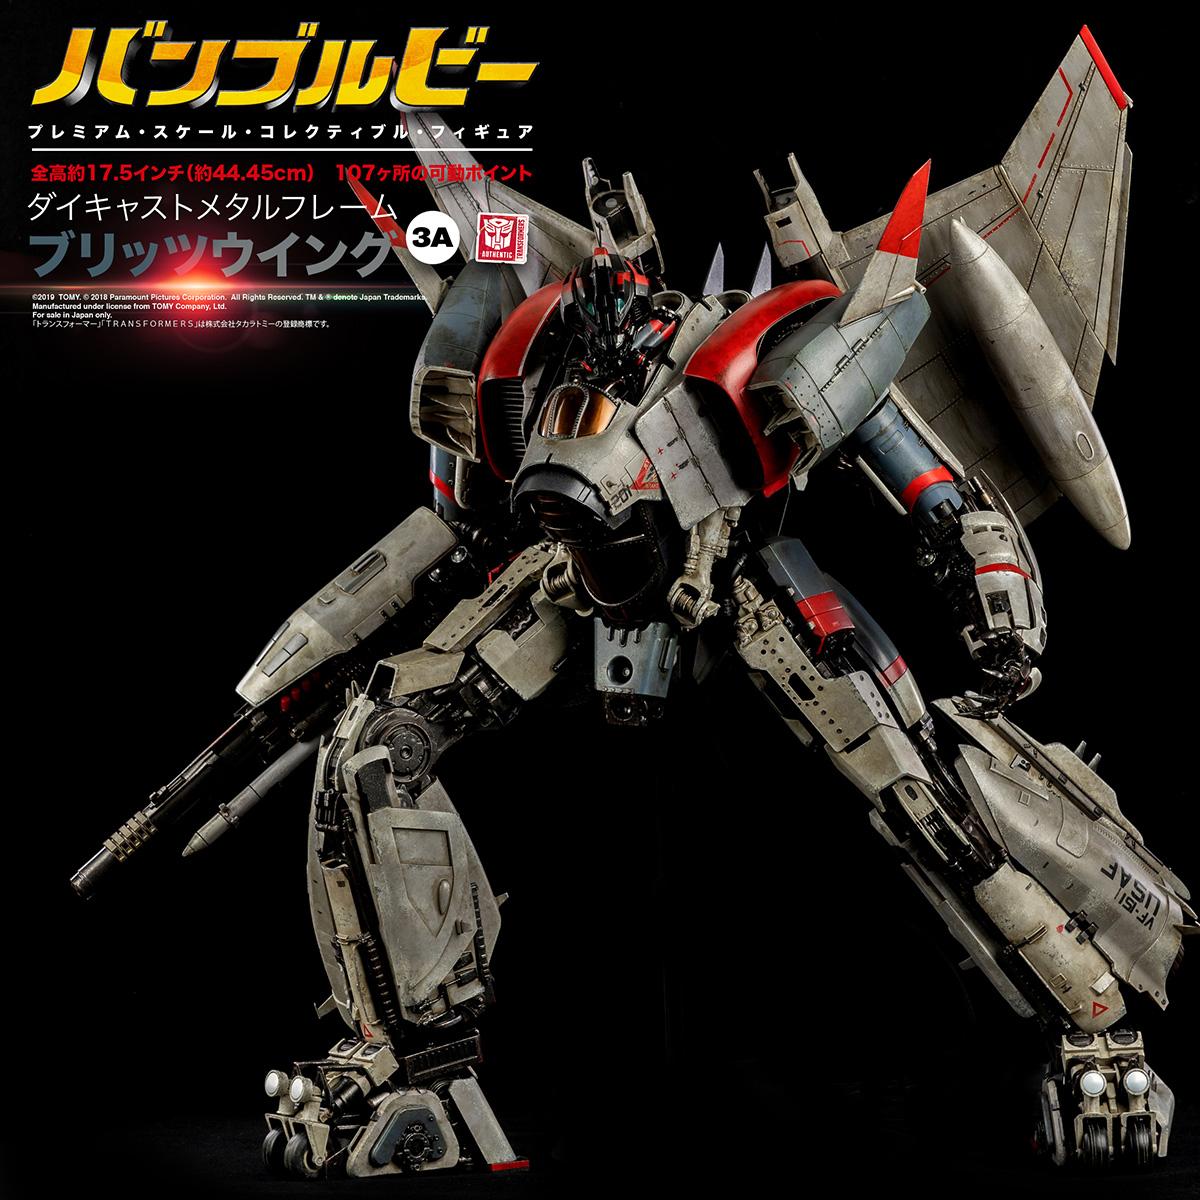 Blitzwing_PM_JAP_1043.jpg